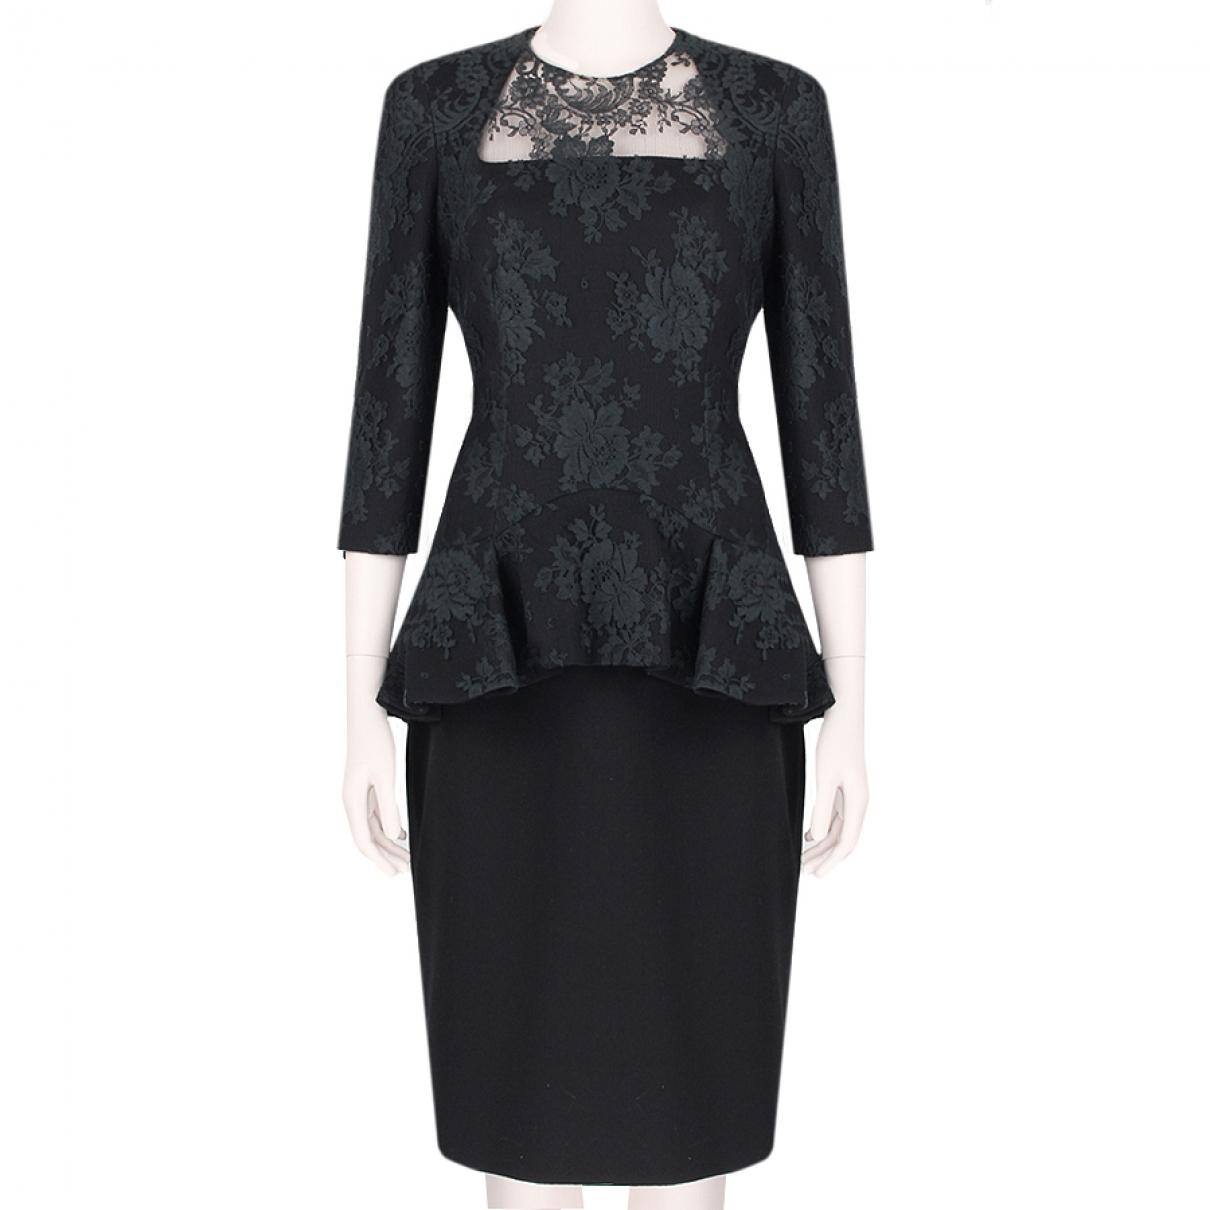 Alexander Mcqueen \N Black Cotton dress for Women 44 IT